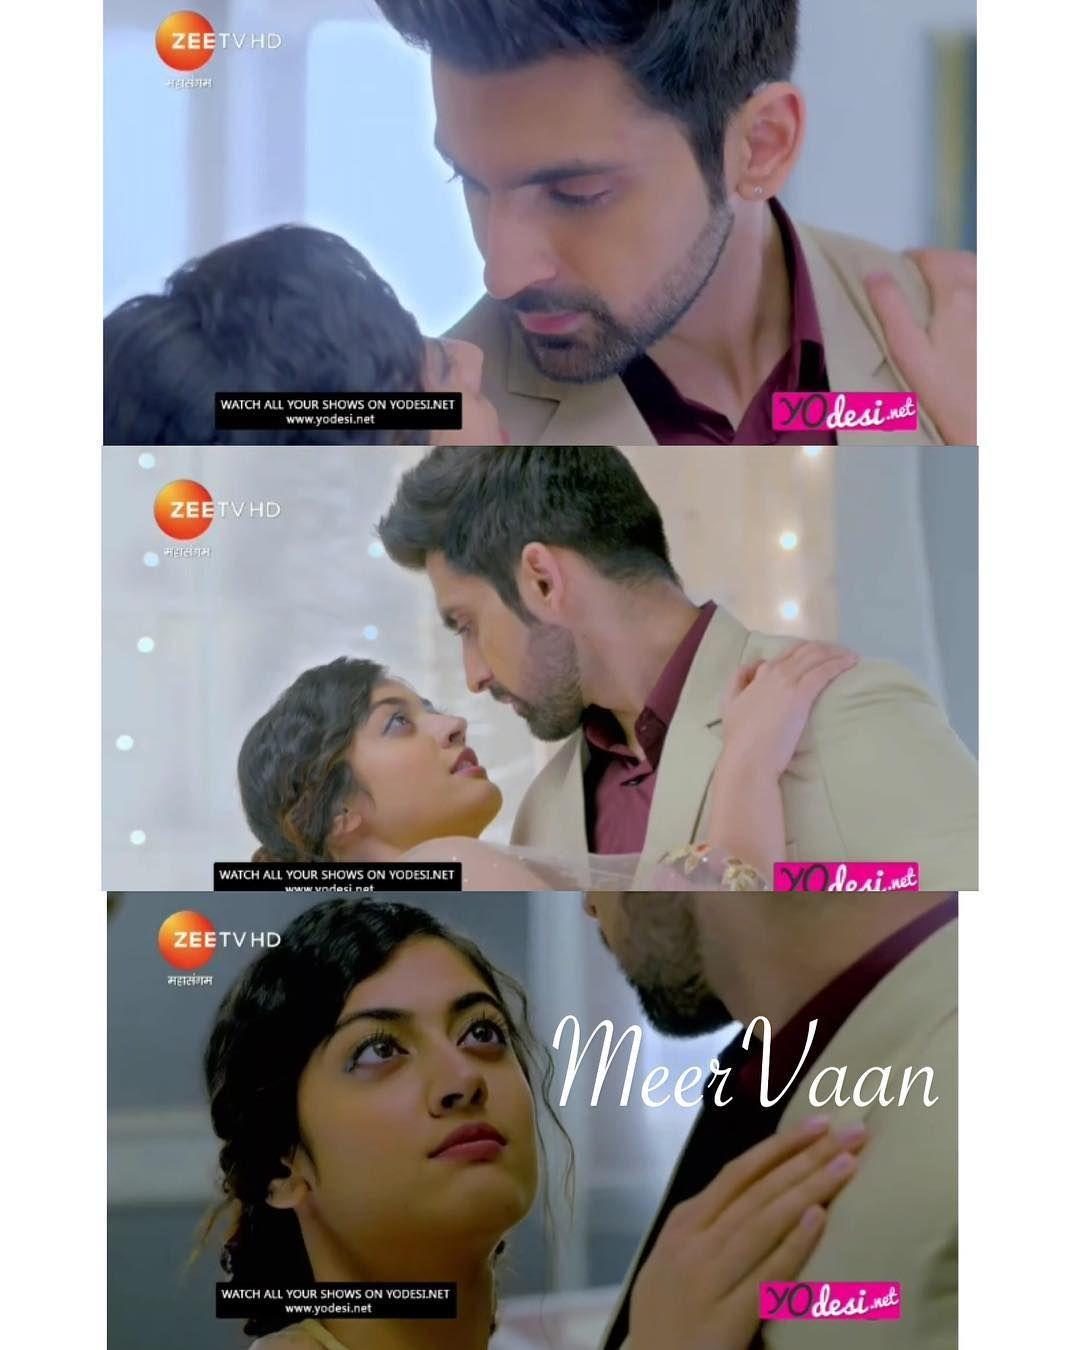 Pin by Ladhasara21 on Keleerein in 2019   Zee tv, Drama